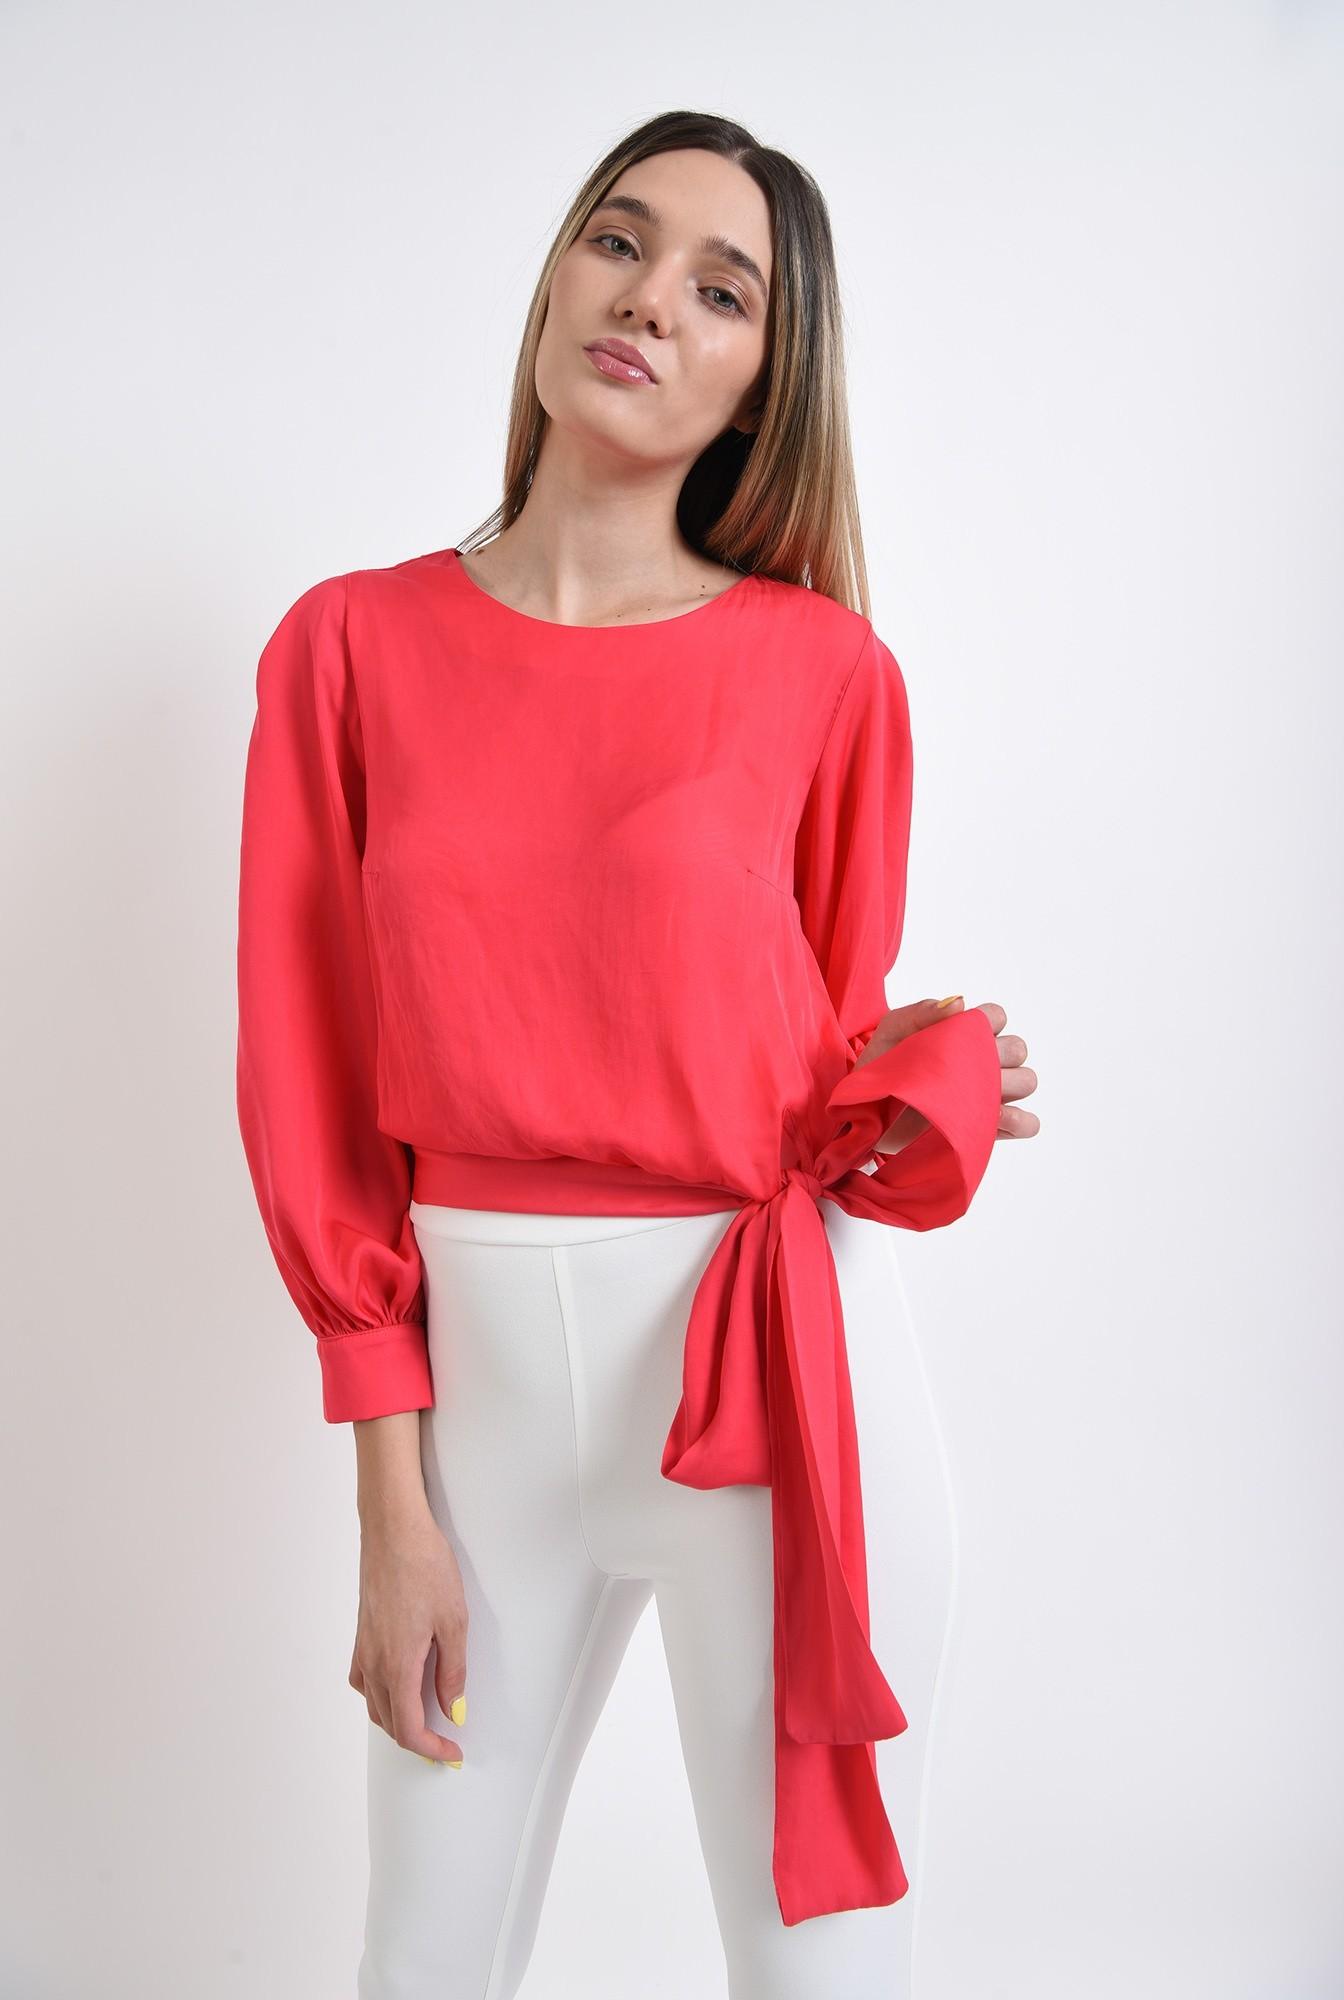 2 - bluza eleganta, poema, fucsia, satin